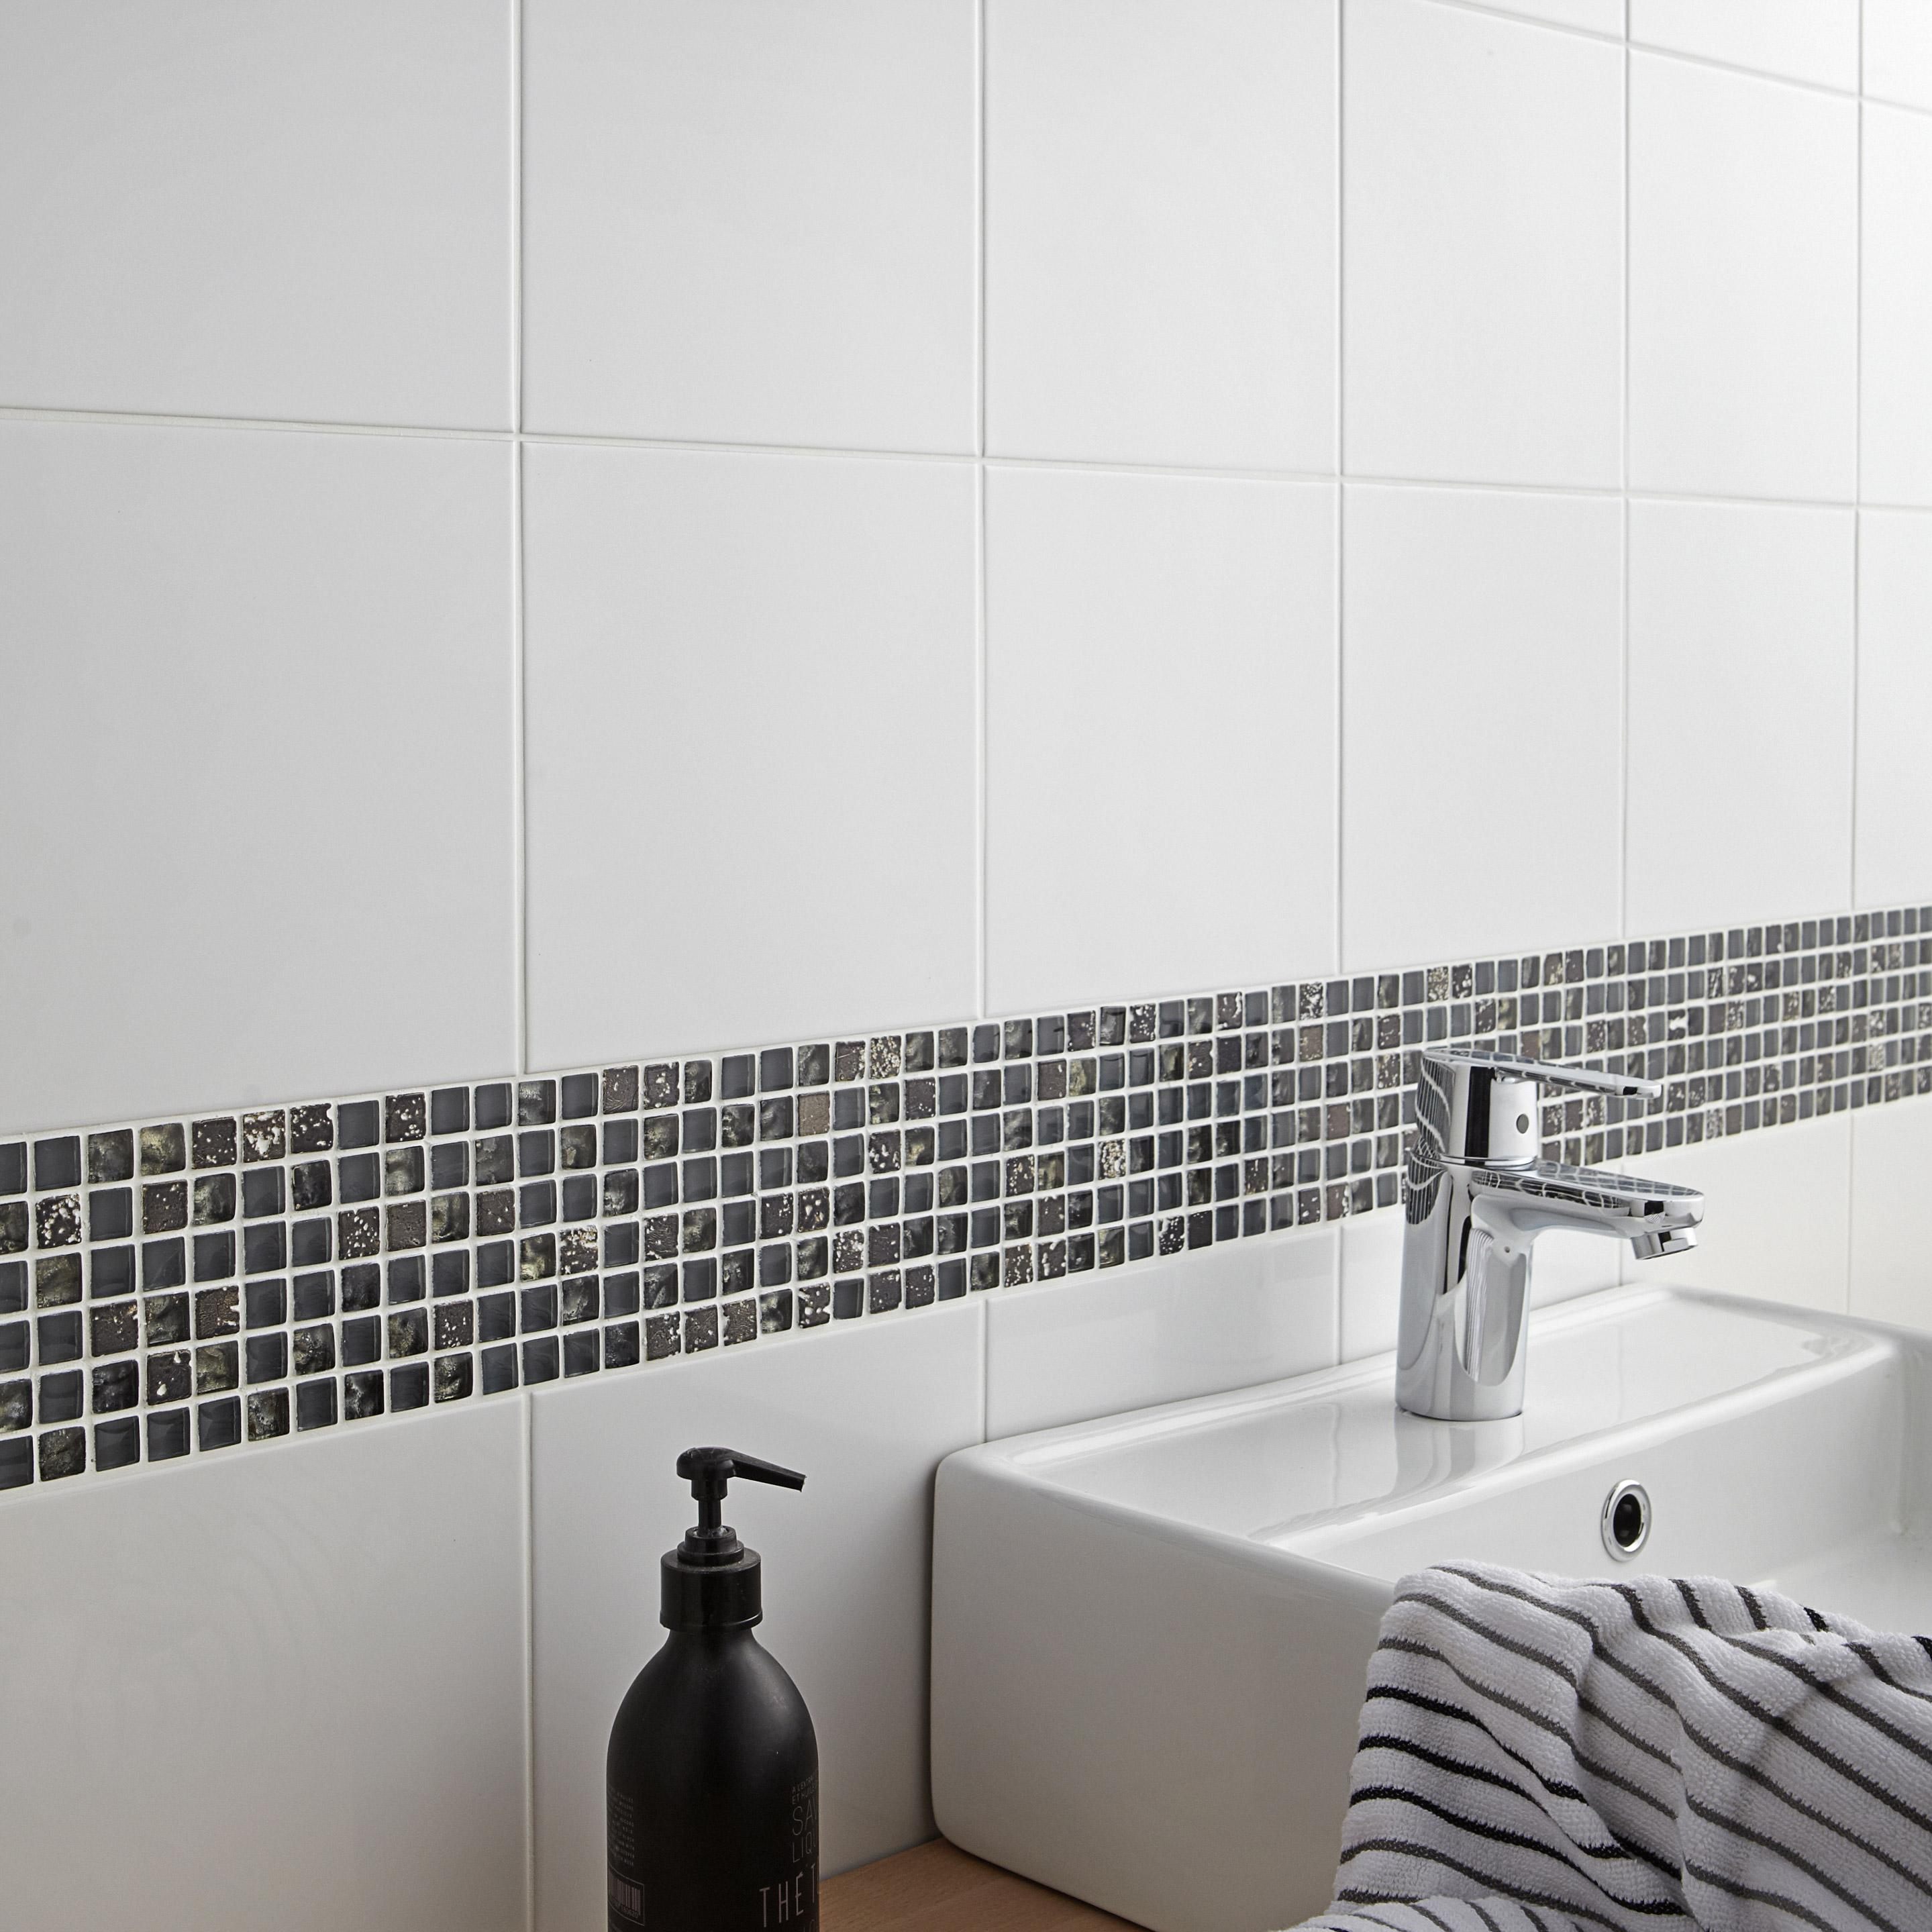 Faïence mur forte uni blanc brillante l.20 x L.20 cm, Basic ECOCERAMIC